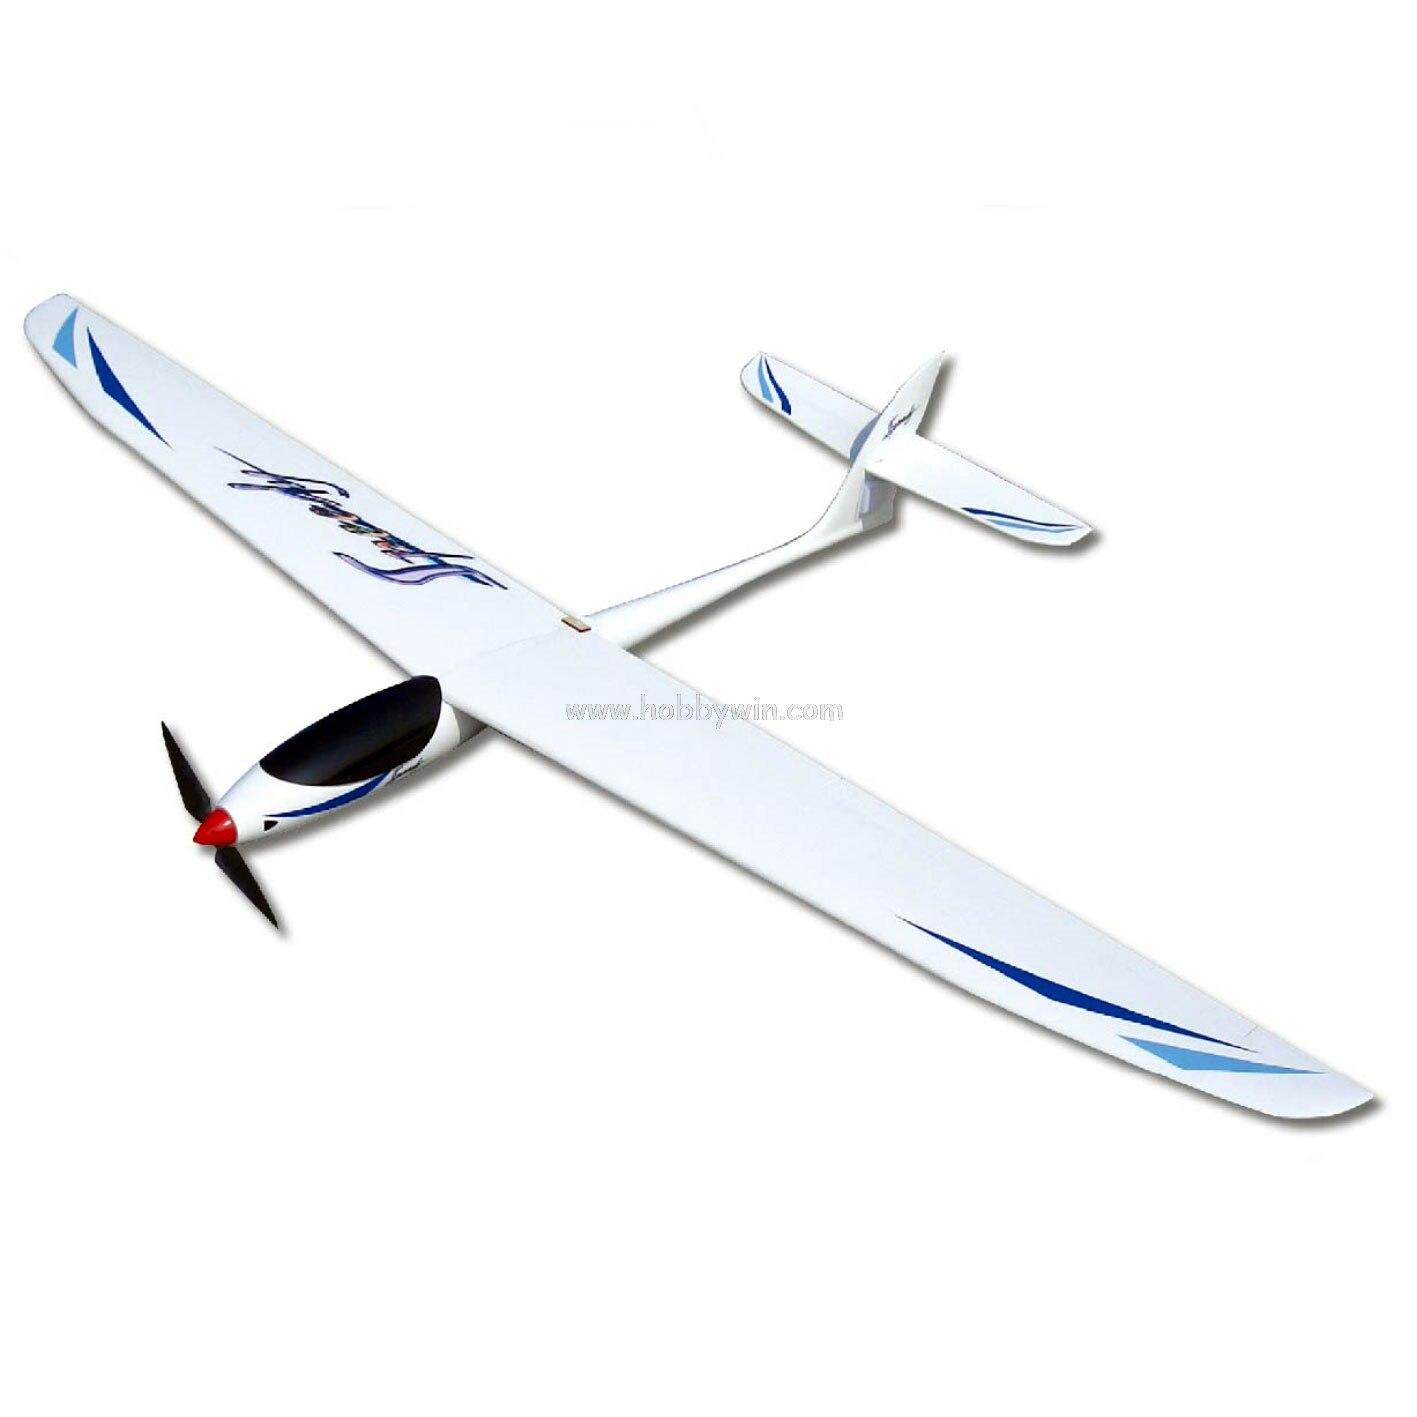 Speedy Electric Glider 1600mm PNP with Motor & Propeller & Esc & Servo RC Fiberglass Wood sailplane model